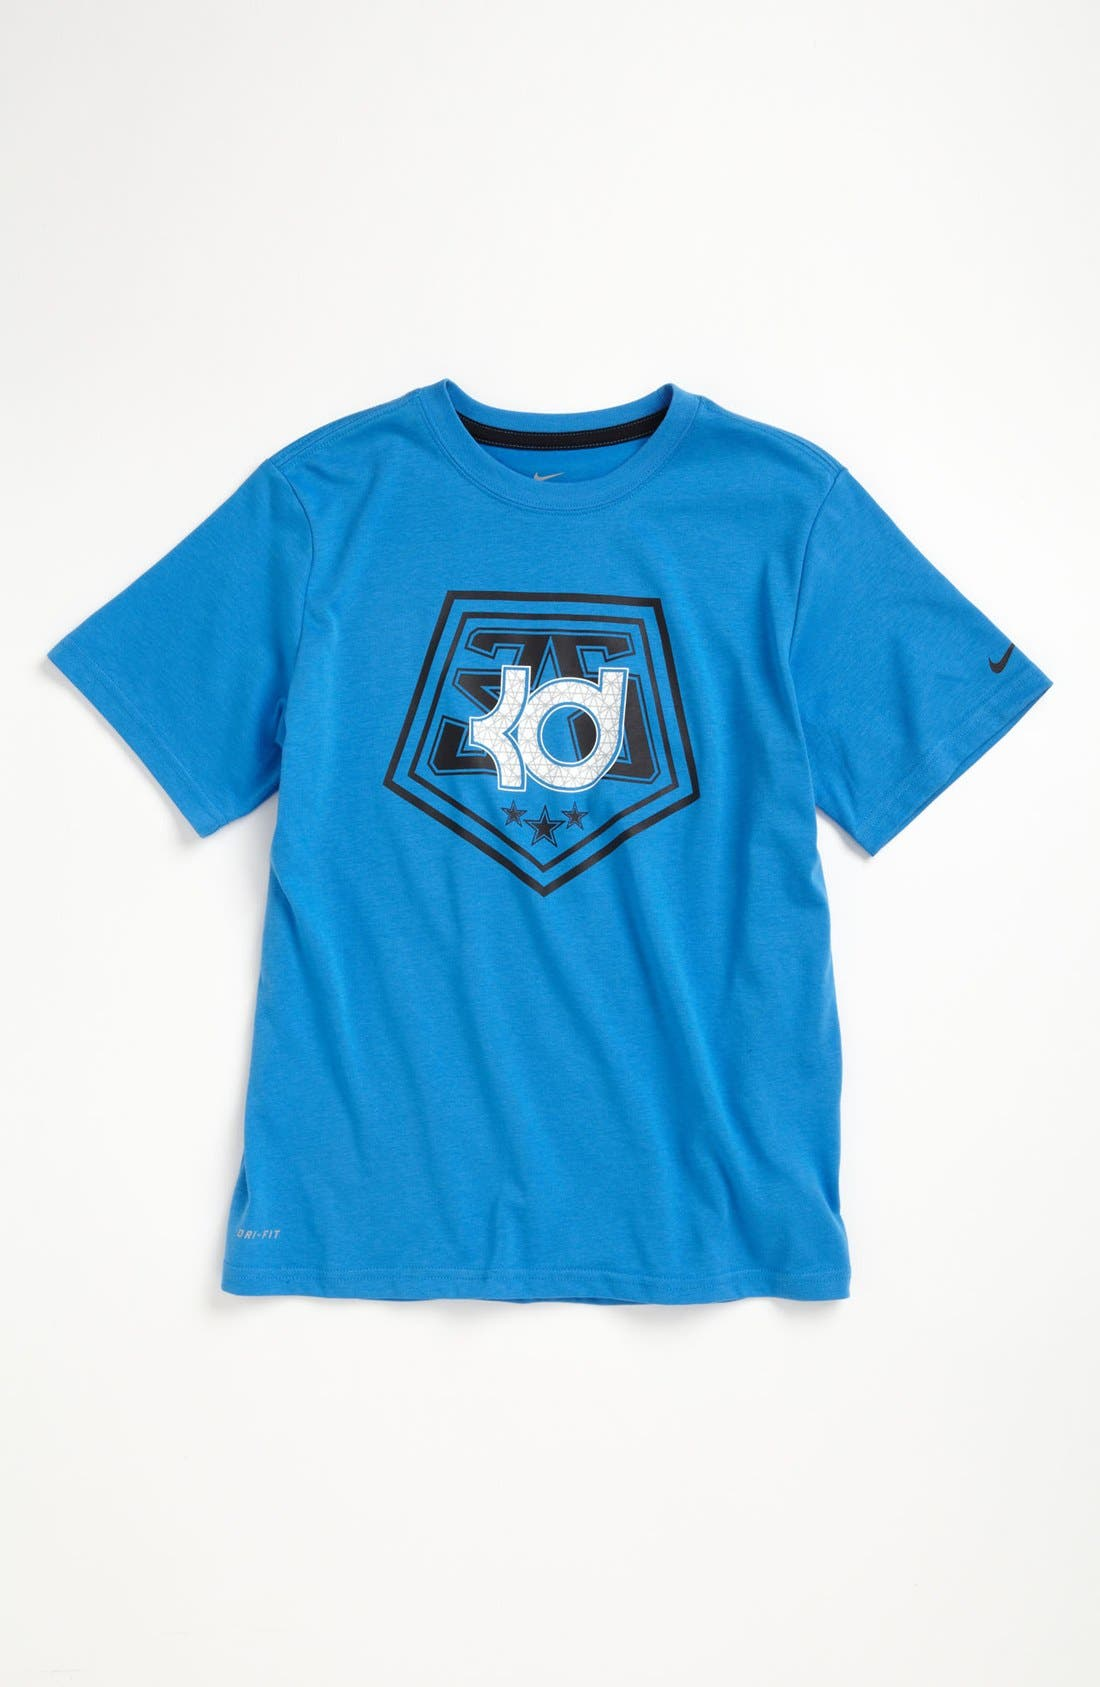 Alternate Image 1 Selected - Nike 'Crest' Dri-FIT T-Shirt